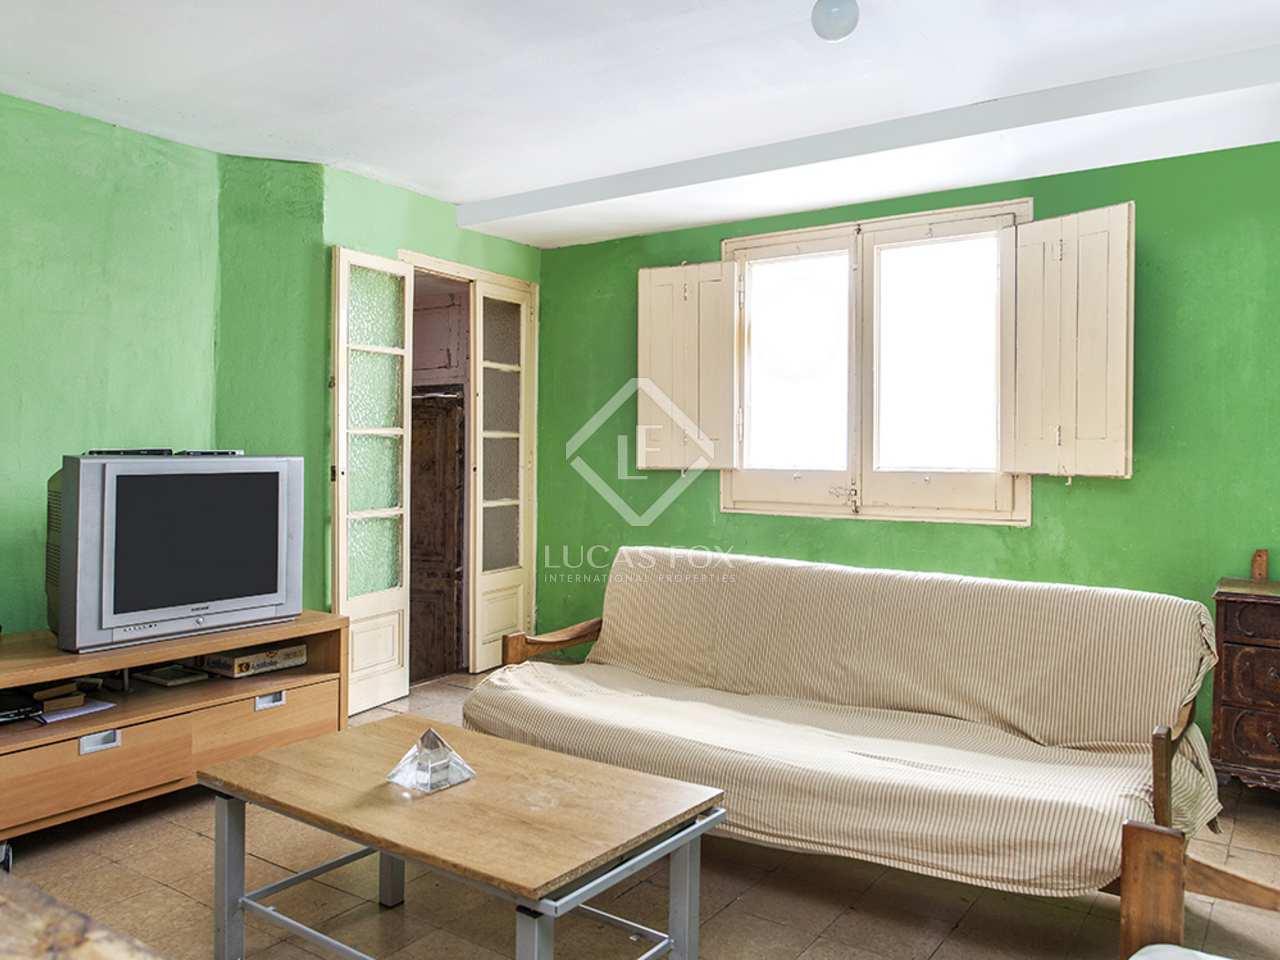 Appartement de 137m a vendre g tico barcelone for Appartement avec piscine barcelone